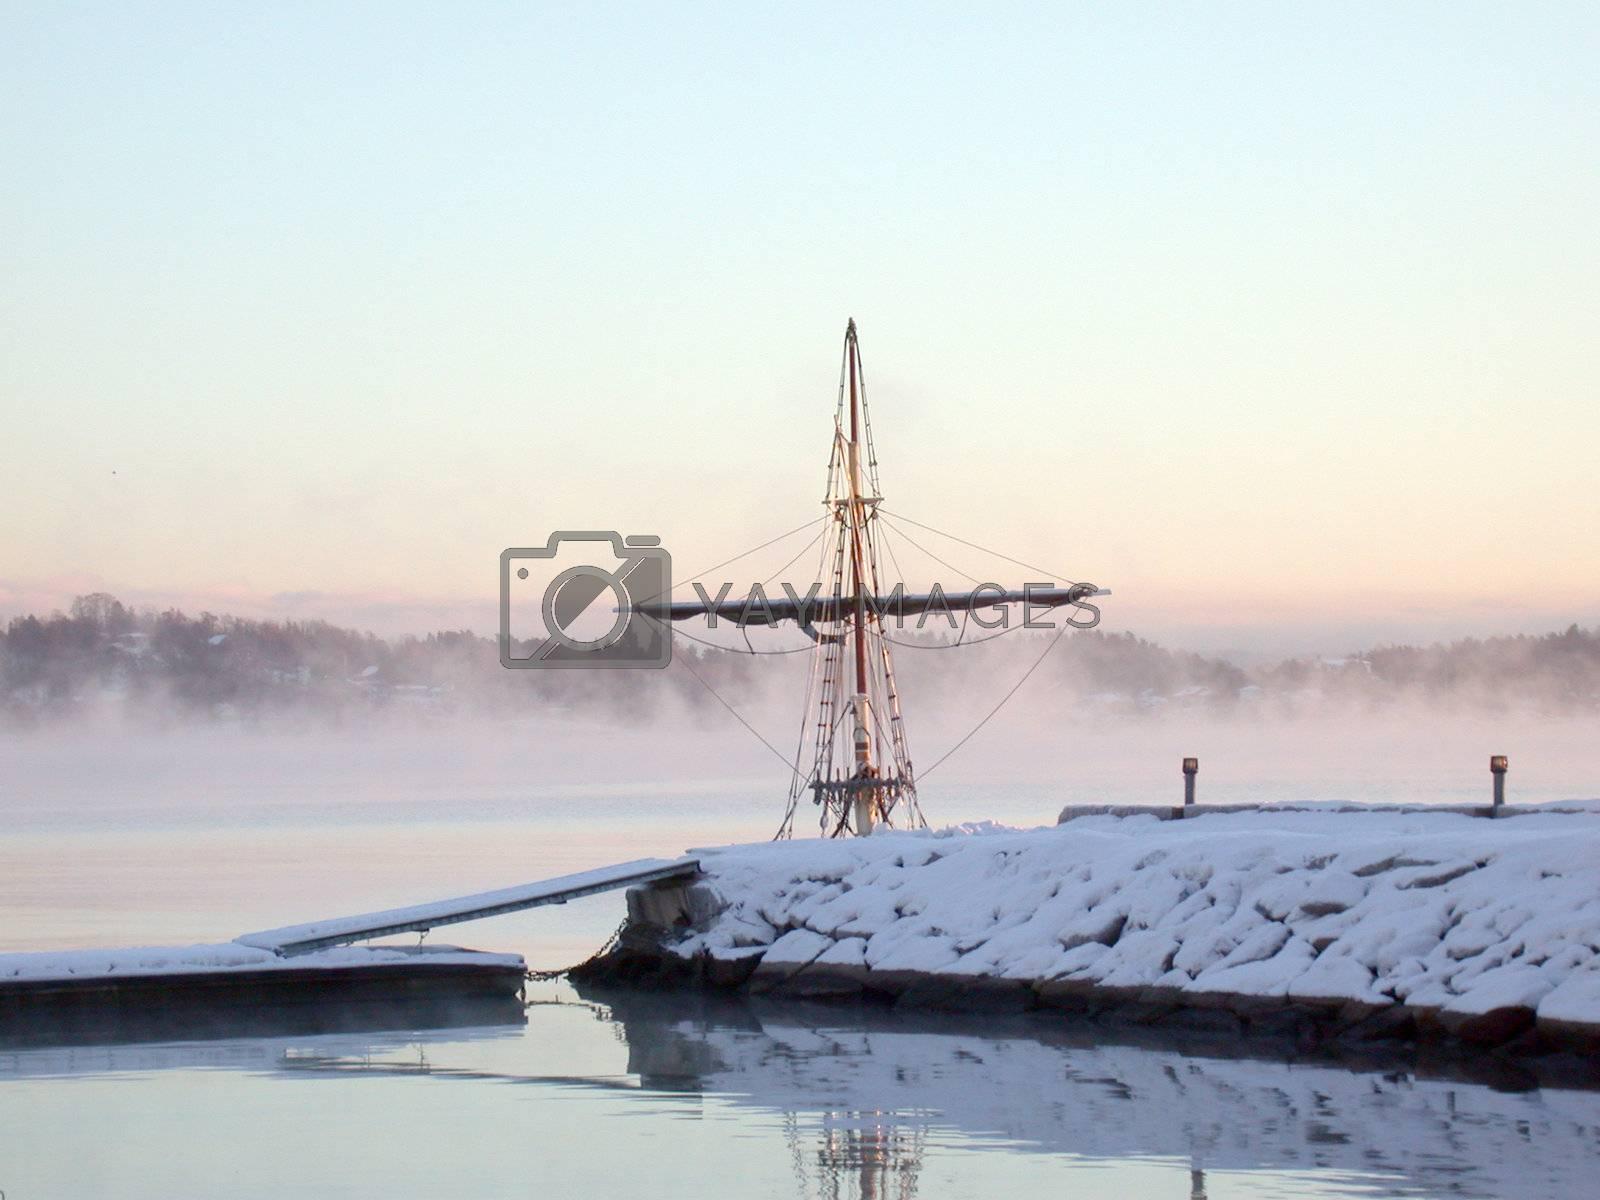 sailbridge at misty morning in december